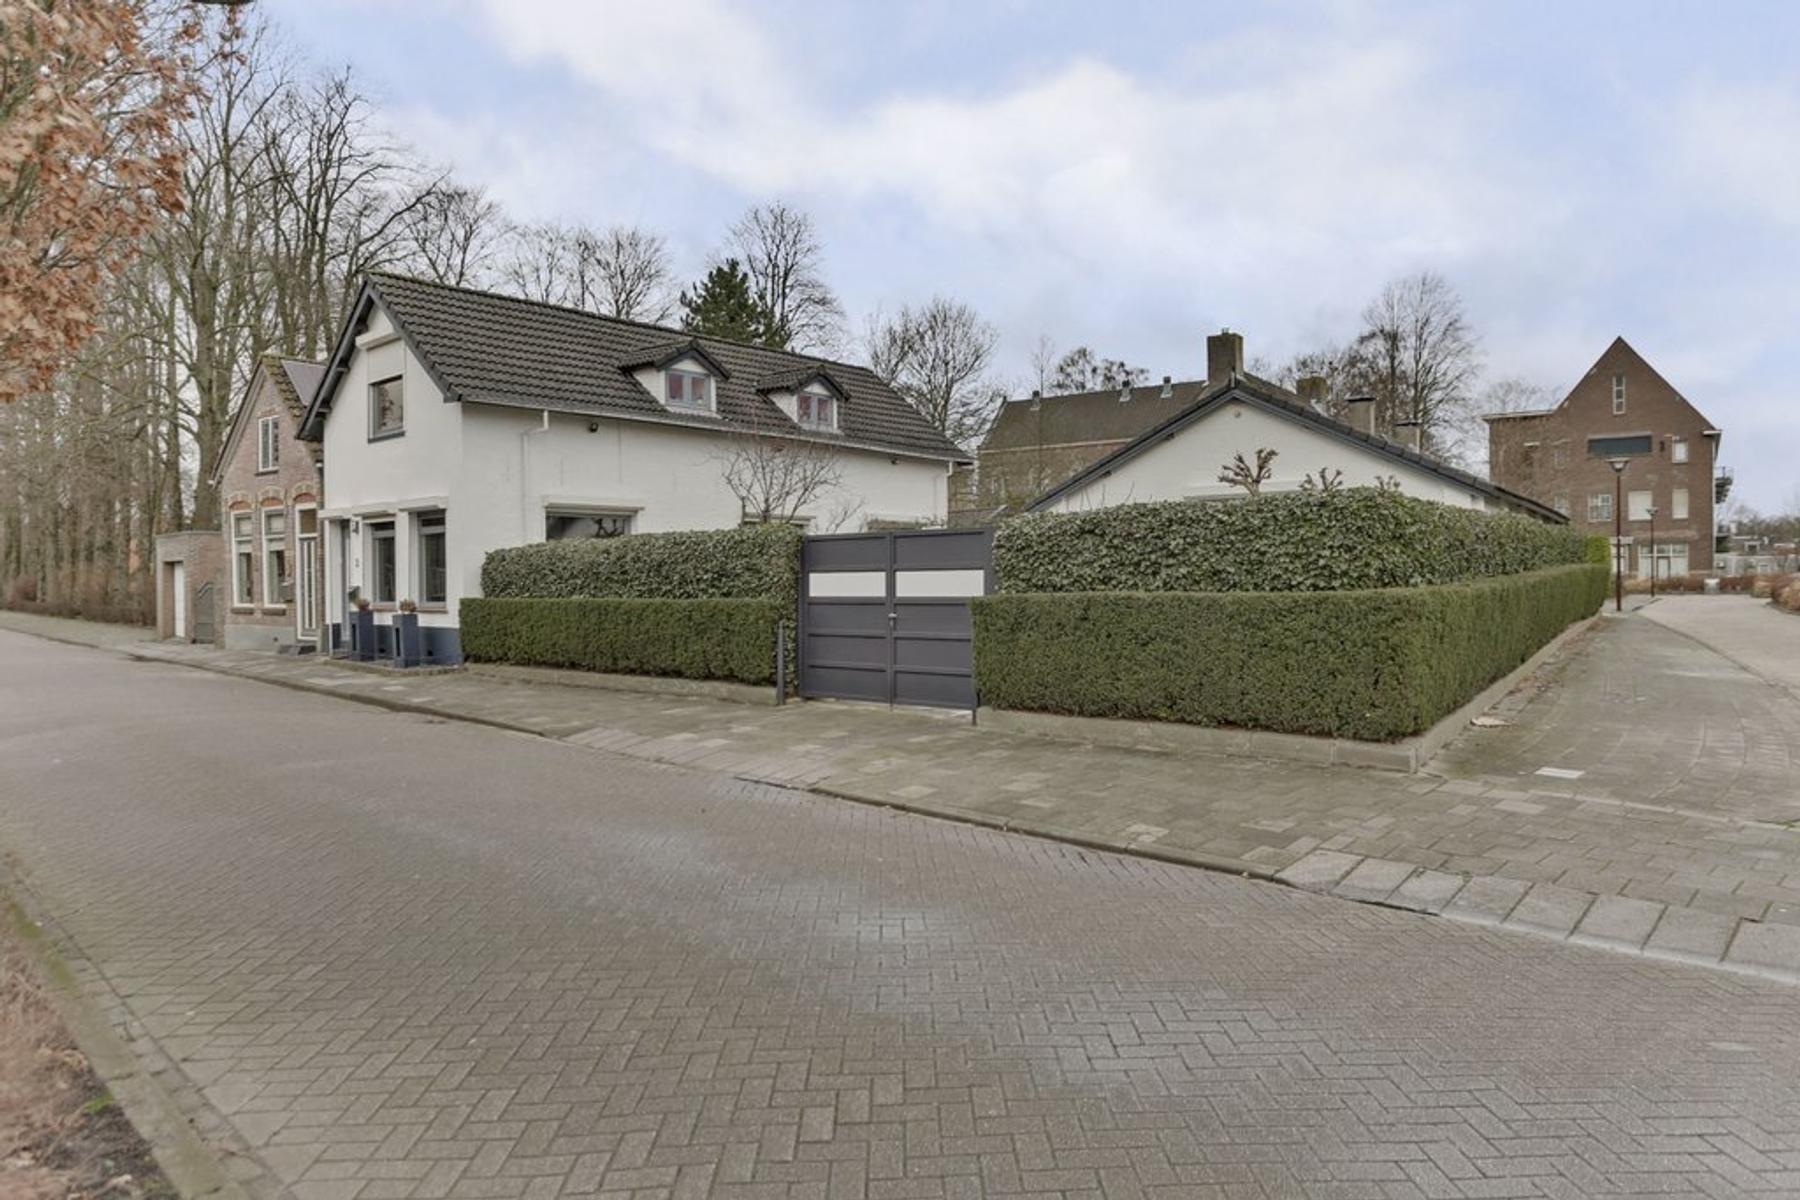 Pagnevaartweg 3 in Oudenbosch 4731 AA